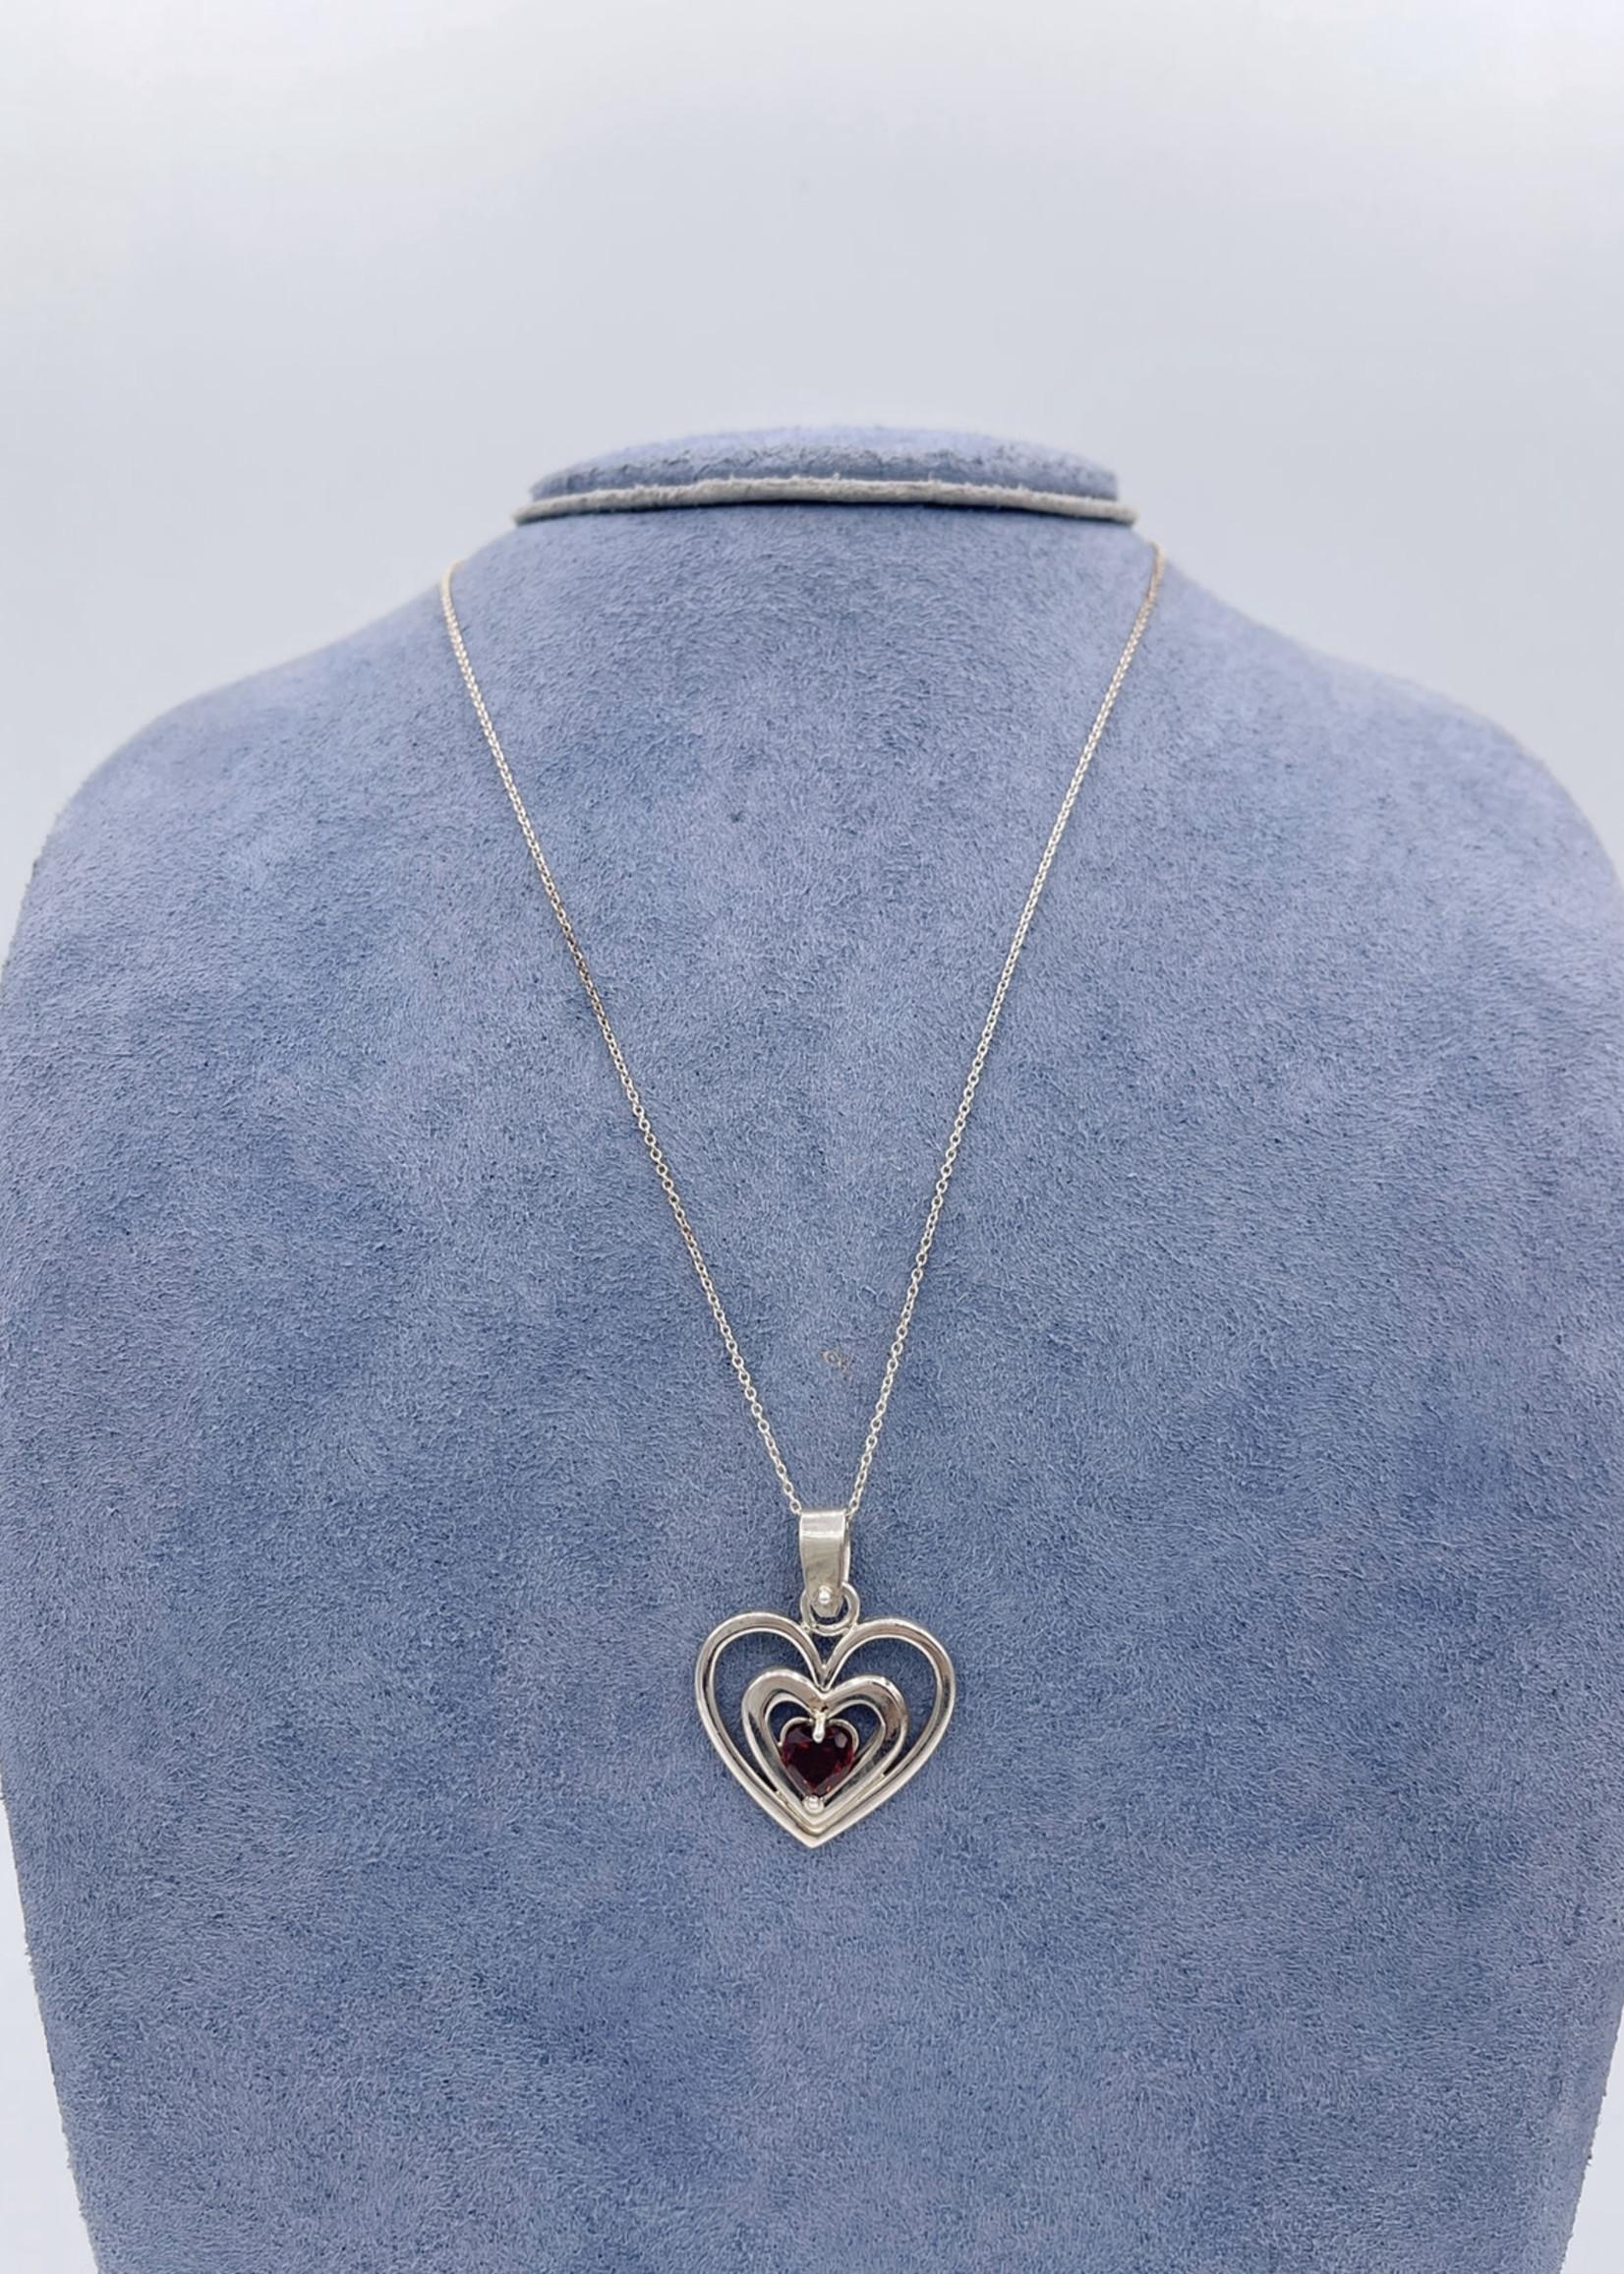 CJ Designs Garnet Heart Pendant